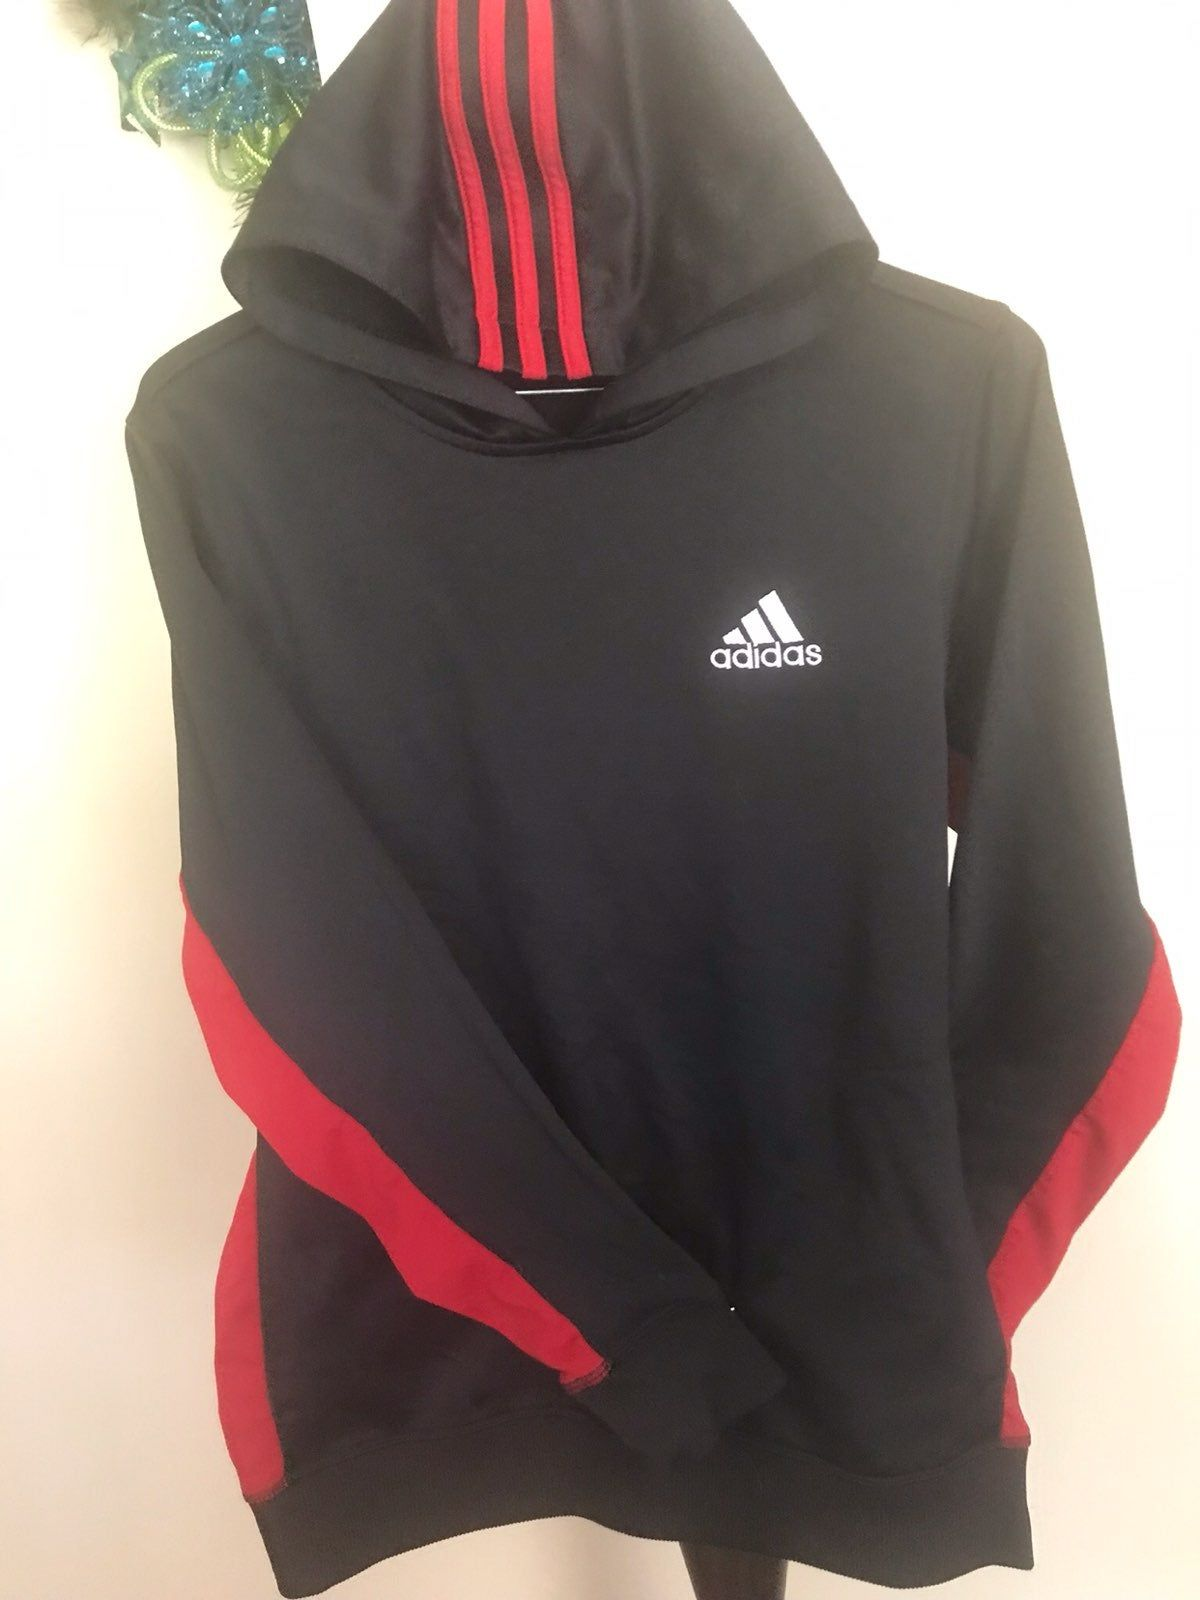 topp design super specialerbjudanden super kvalitet Black with red stripes & side panels hoodie. | Adidas Top & t ...